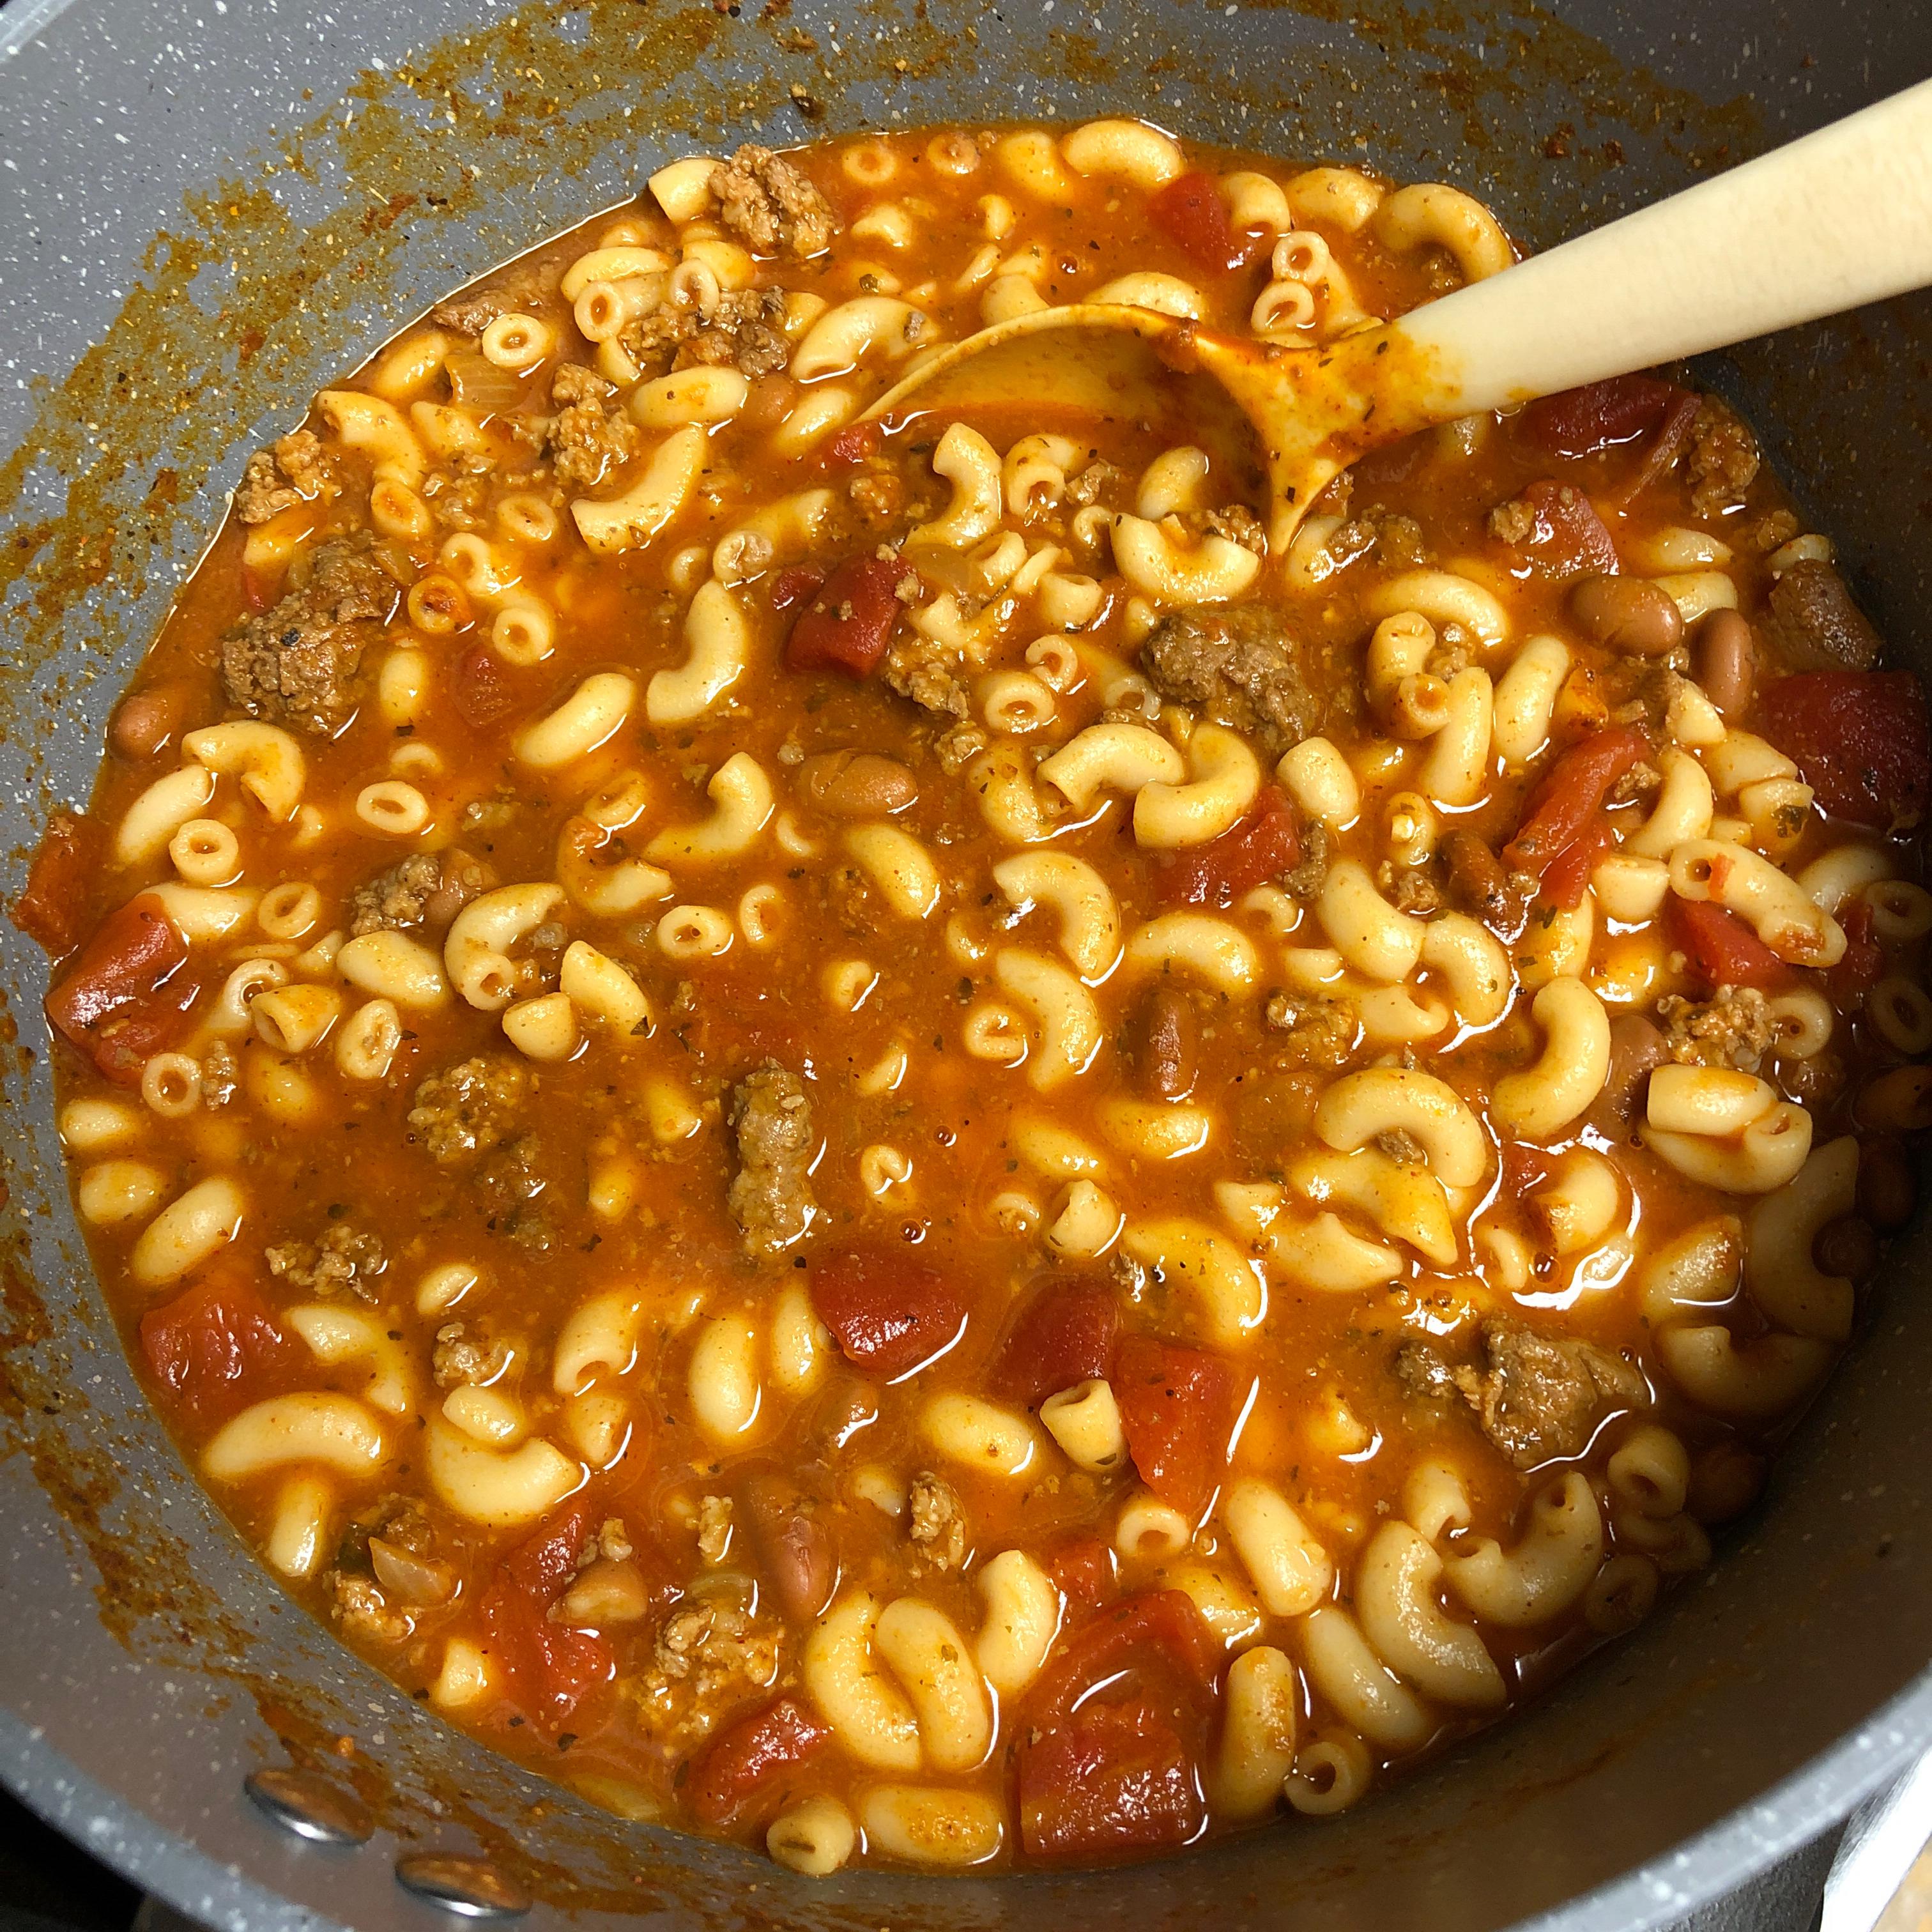 One-Pot Chili Mac and Cheese